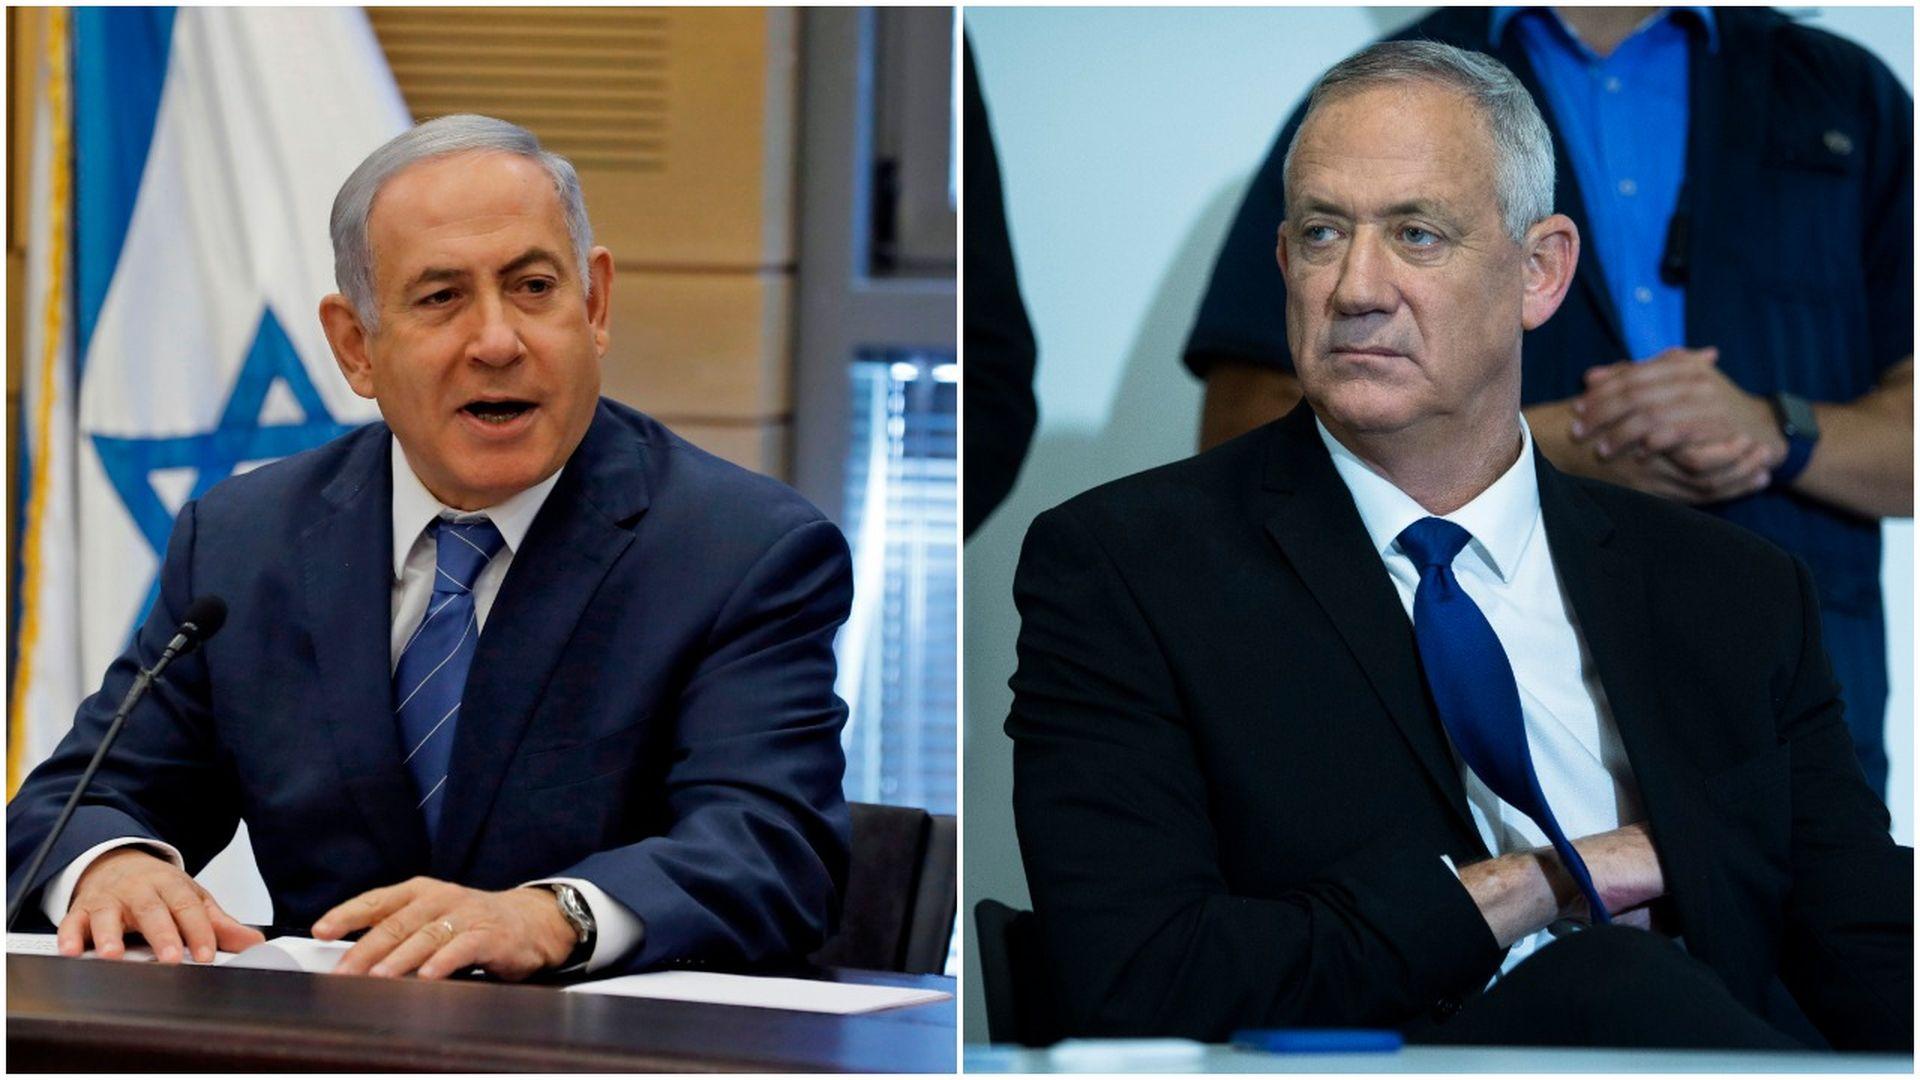 Netanyahu and Benny Gantz